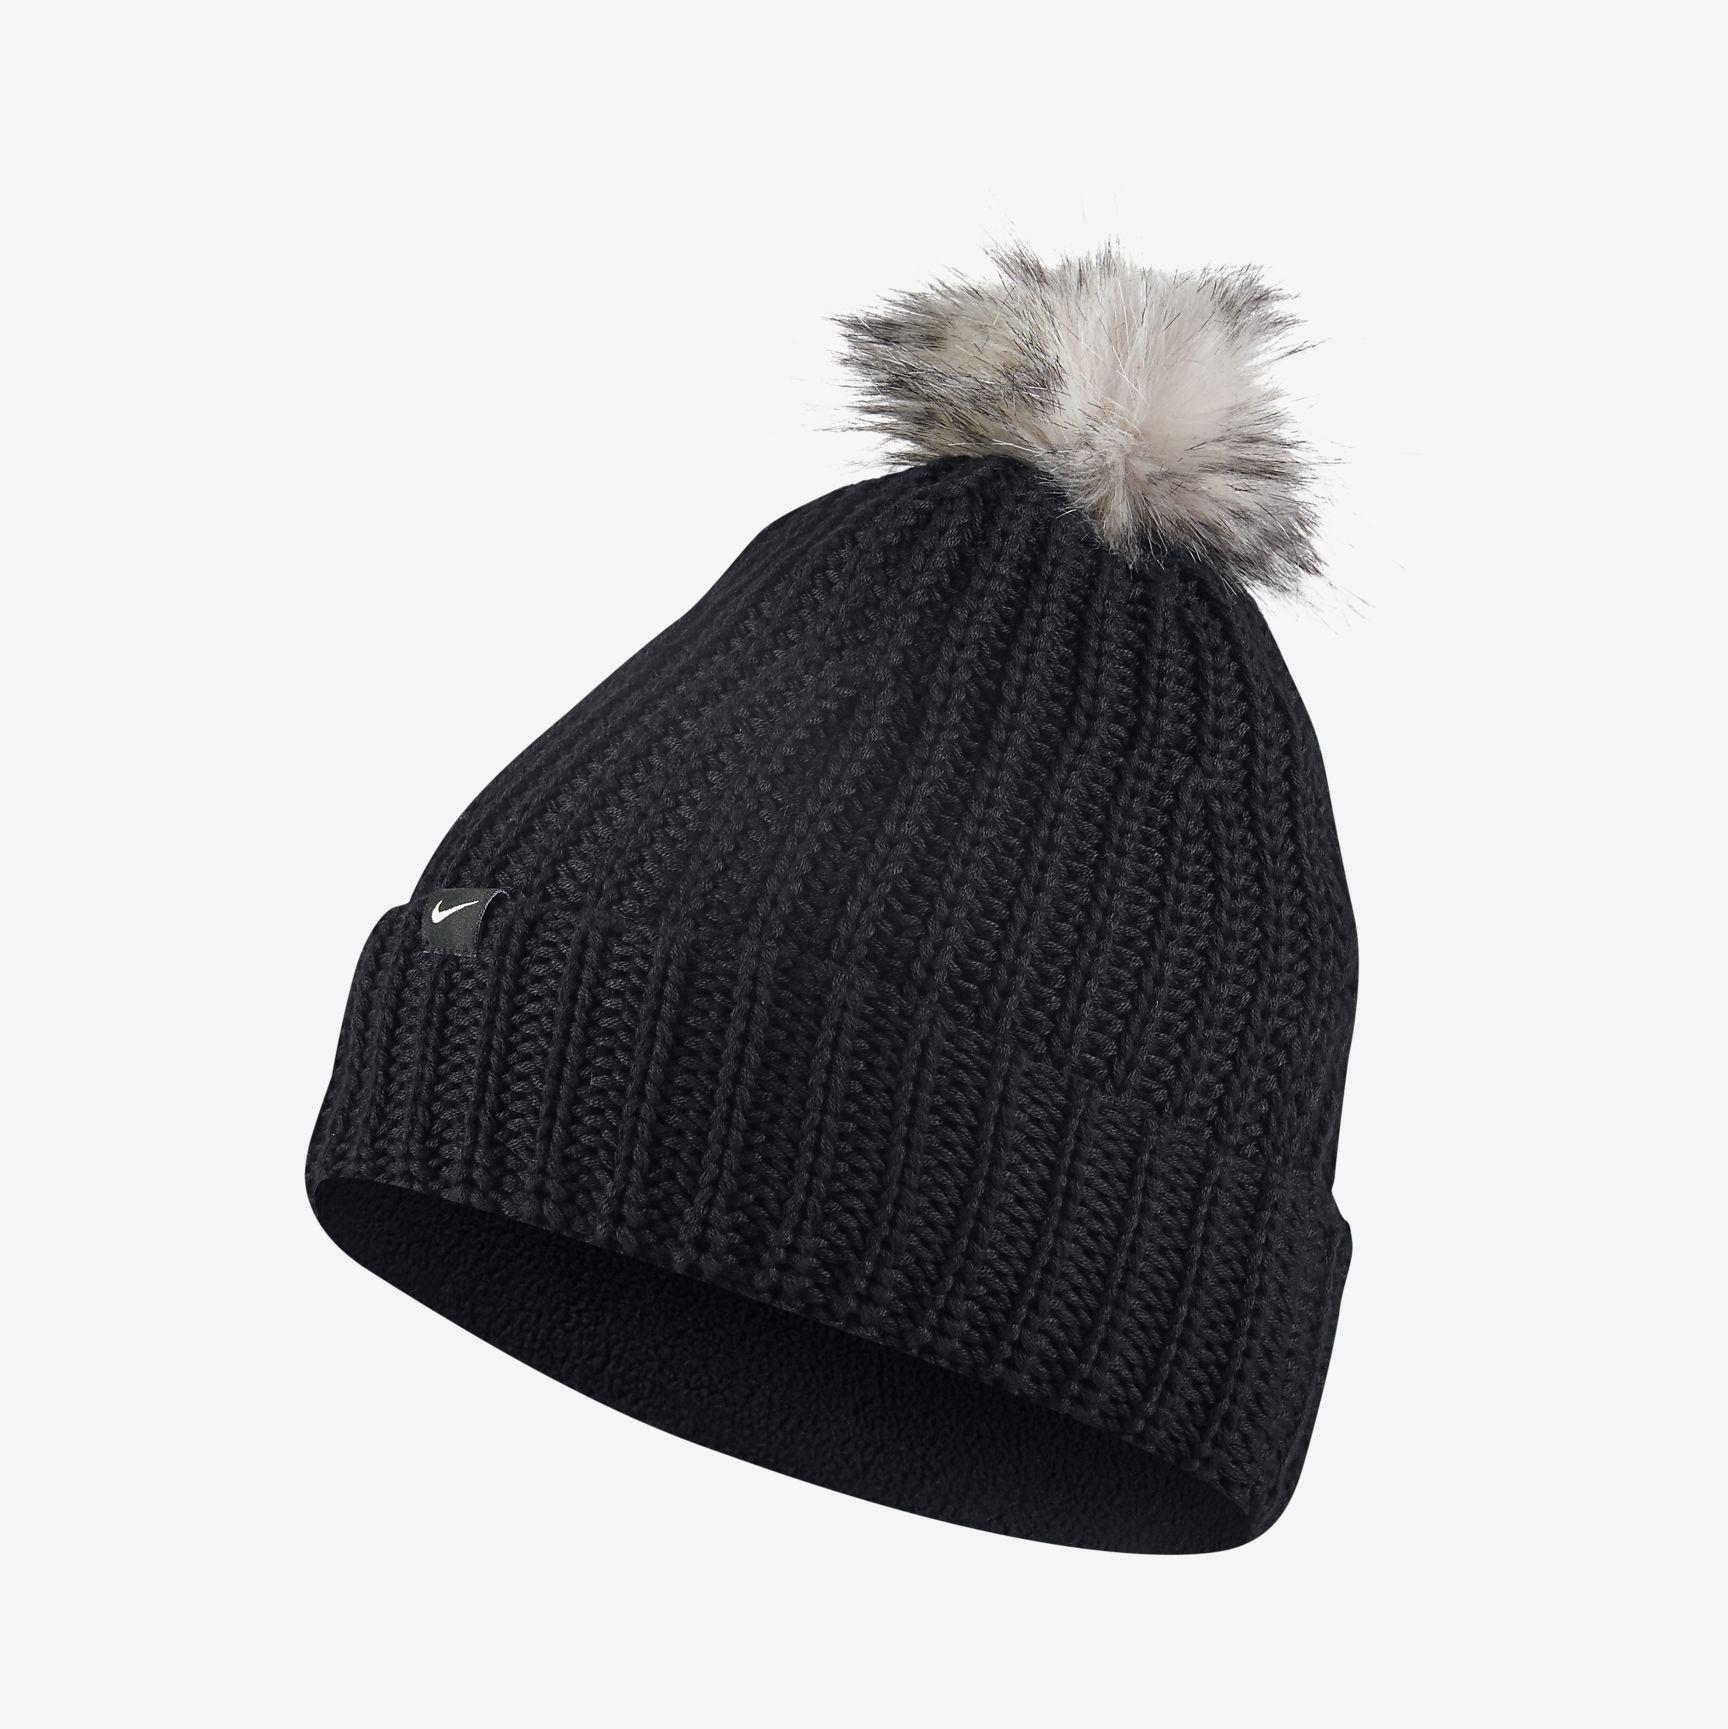 6d89055cbb7 ... australia nike golf pom womens knit hat f599e a8836